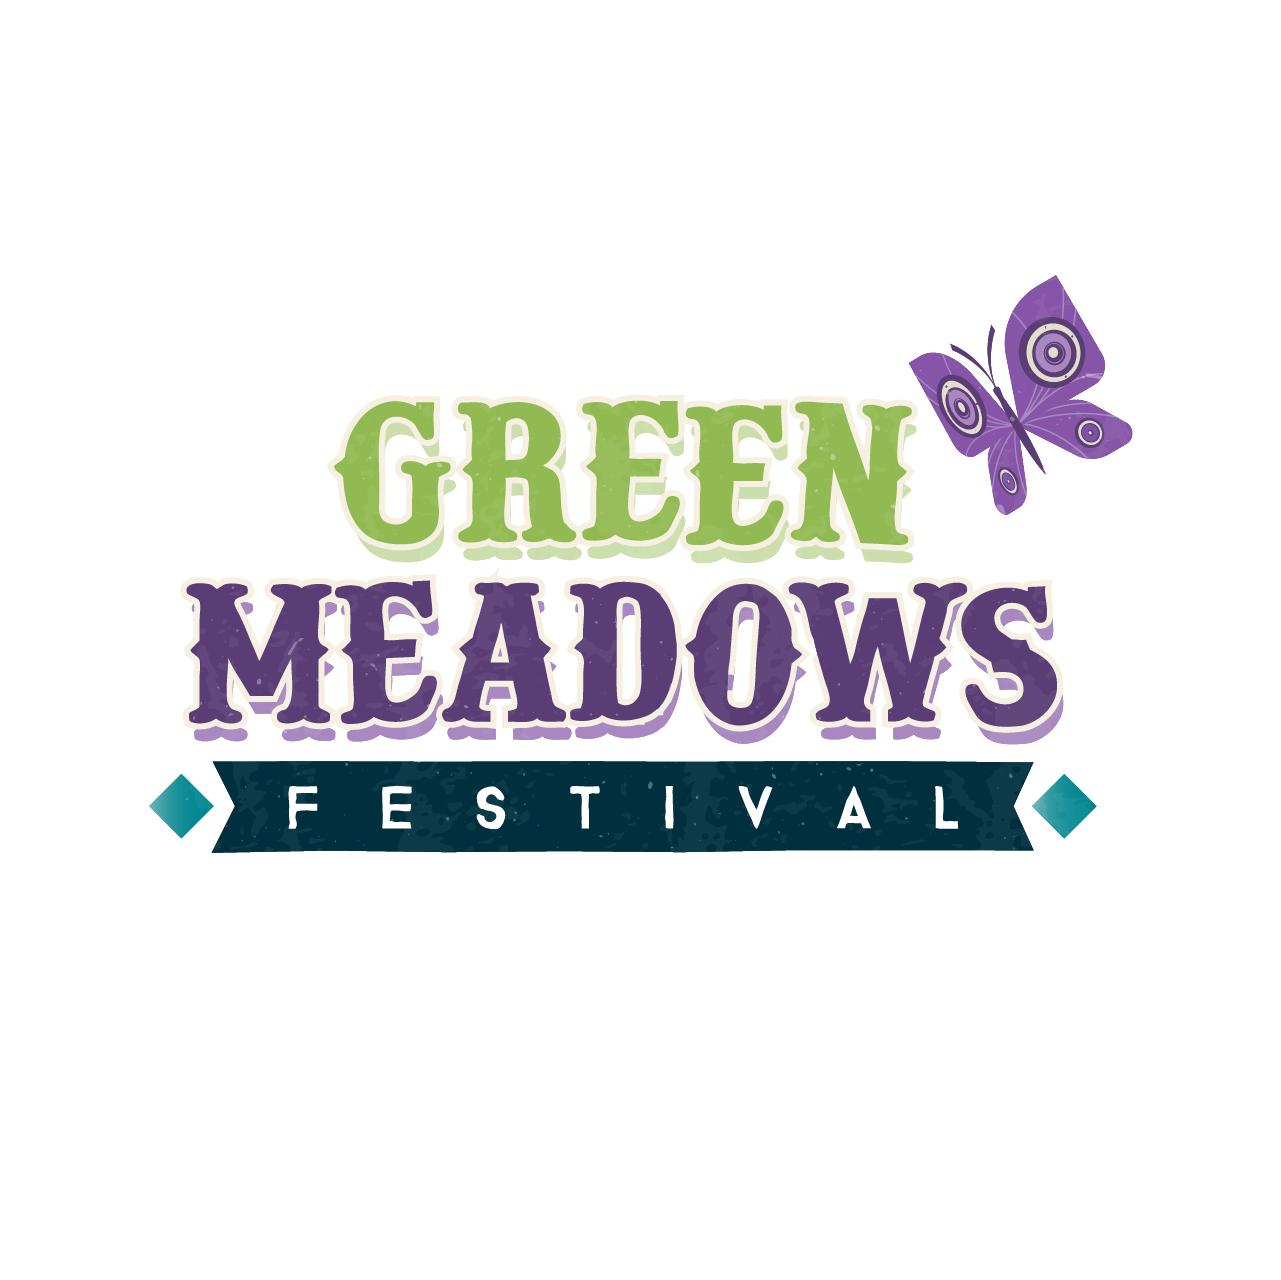 Green Meadows Festival 2019 banner image